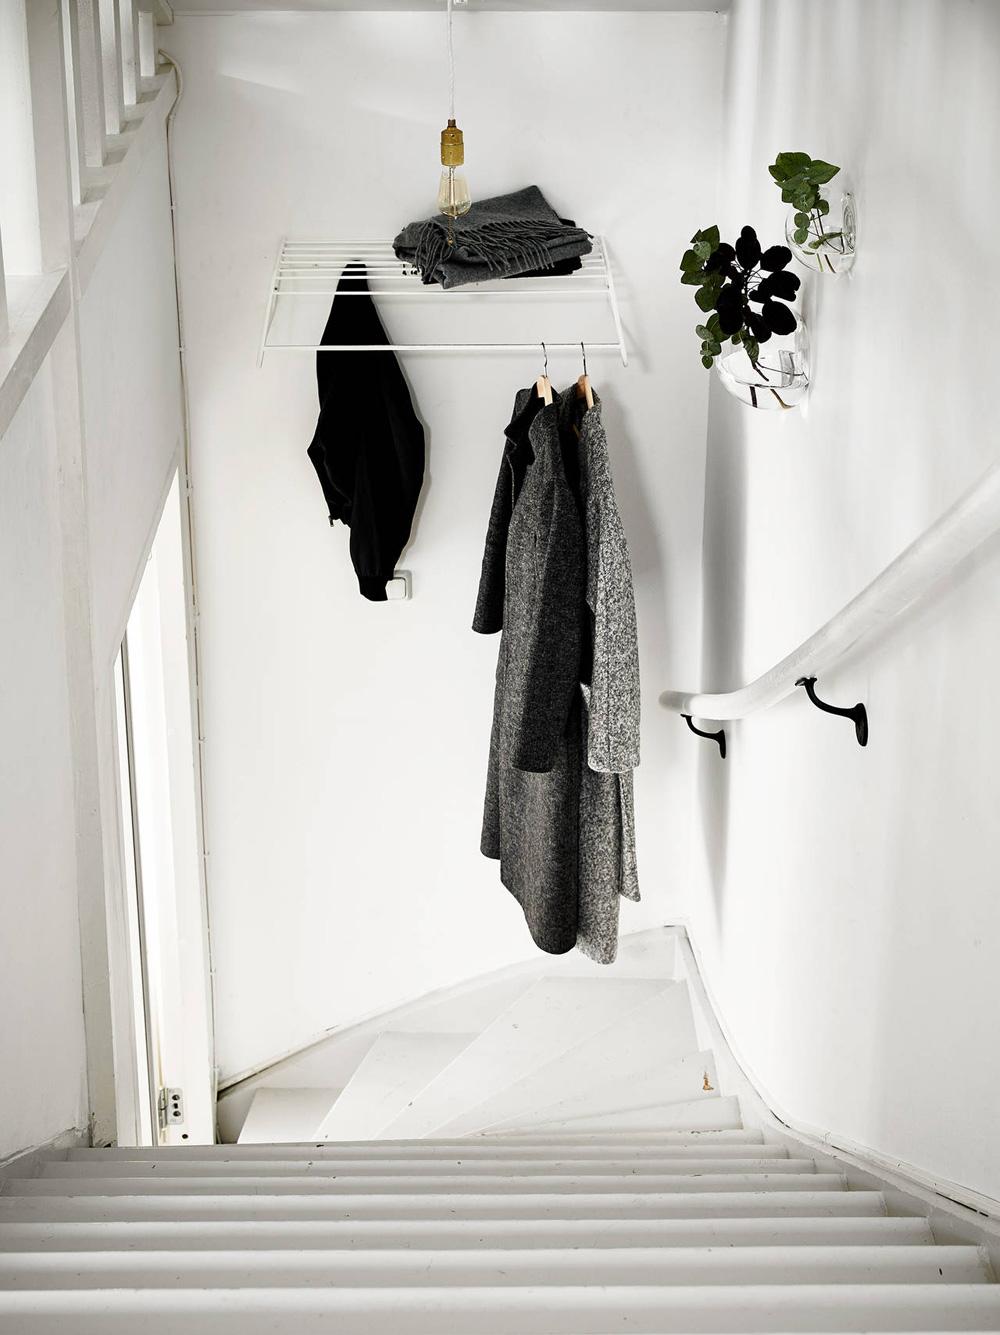 Oracle-Fox-Sunday-Sanctuary-Elsewhere-Small-Apartment-living-Alternative-Scandinvian-Interior-13